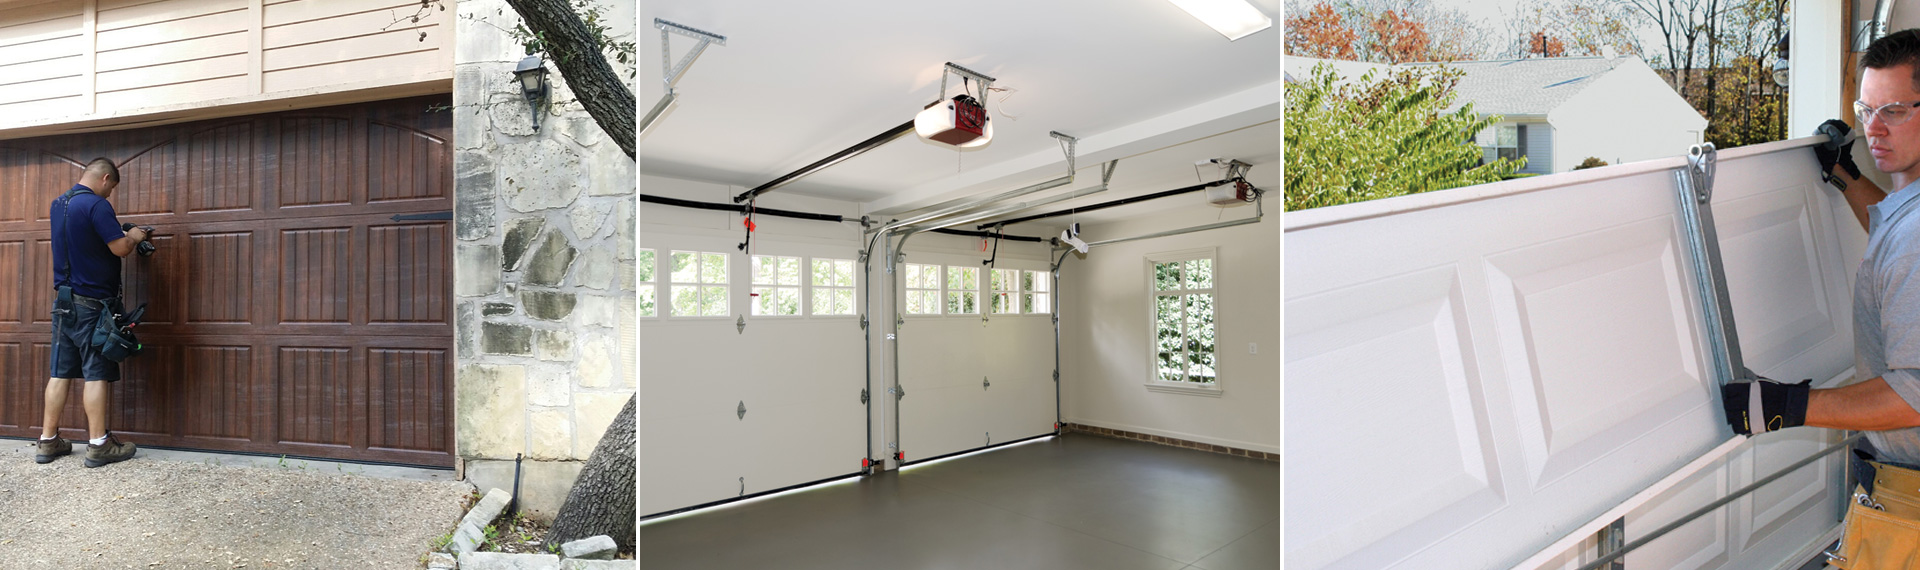 All Garage Door Services Brookhaven PA